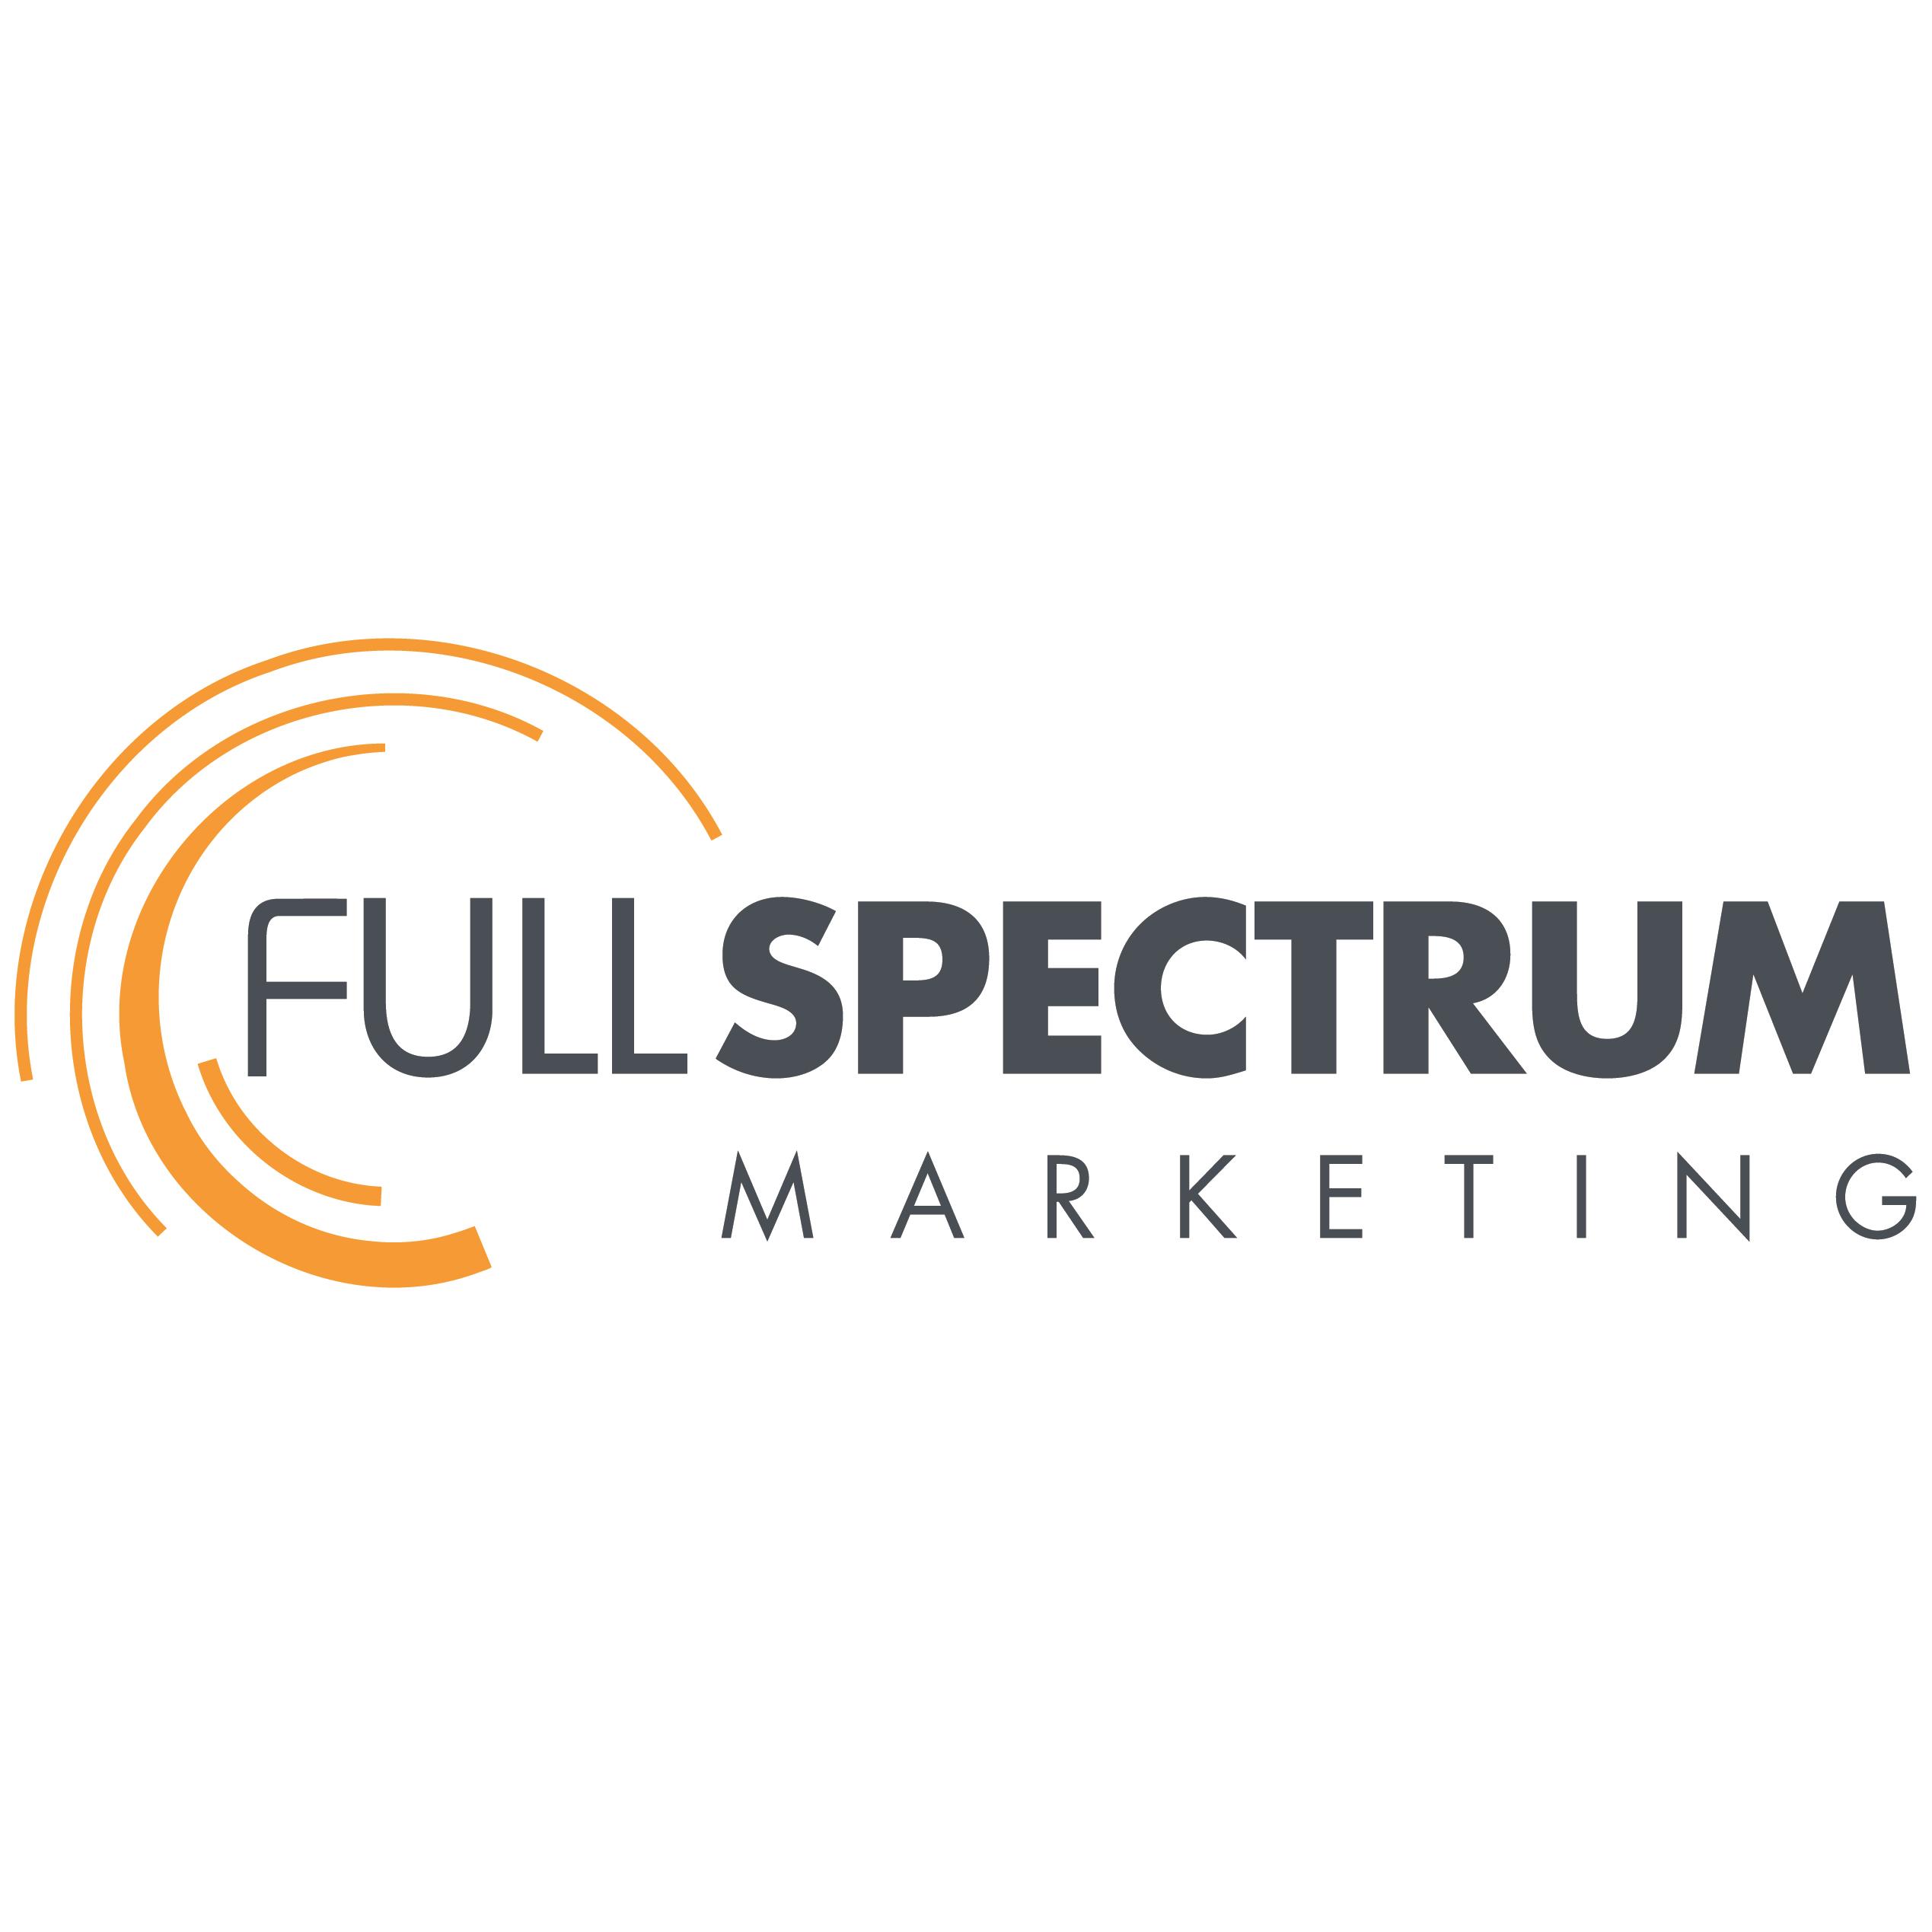 Full Spectrum Marketing